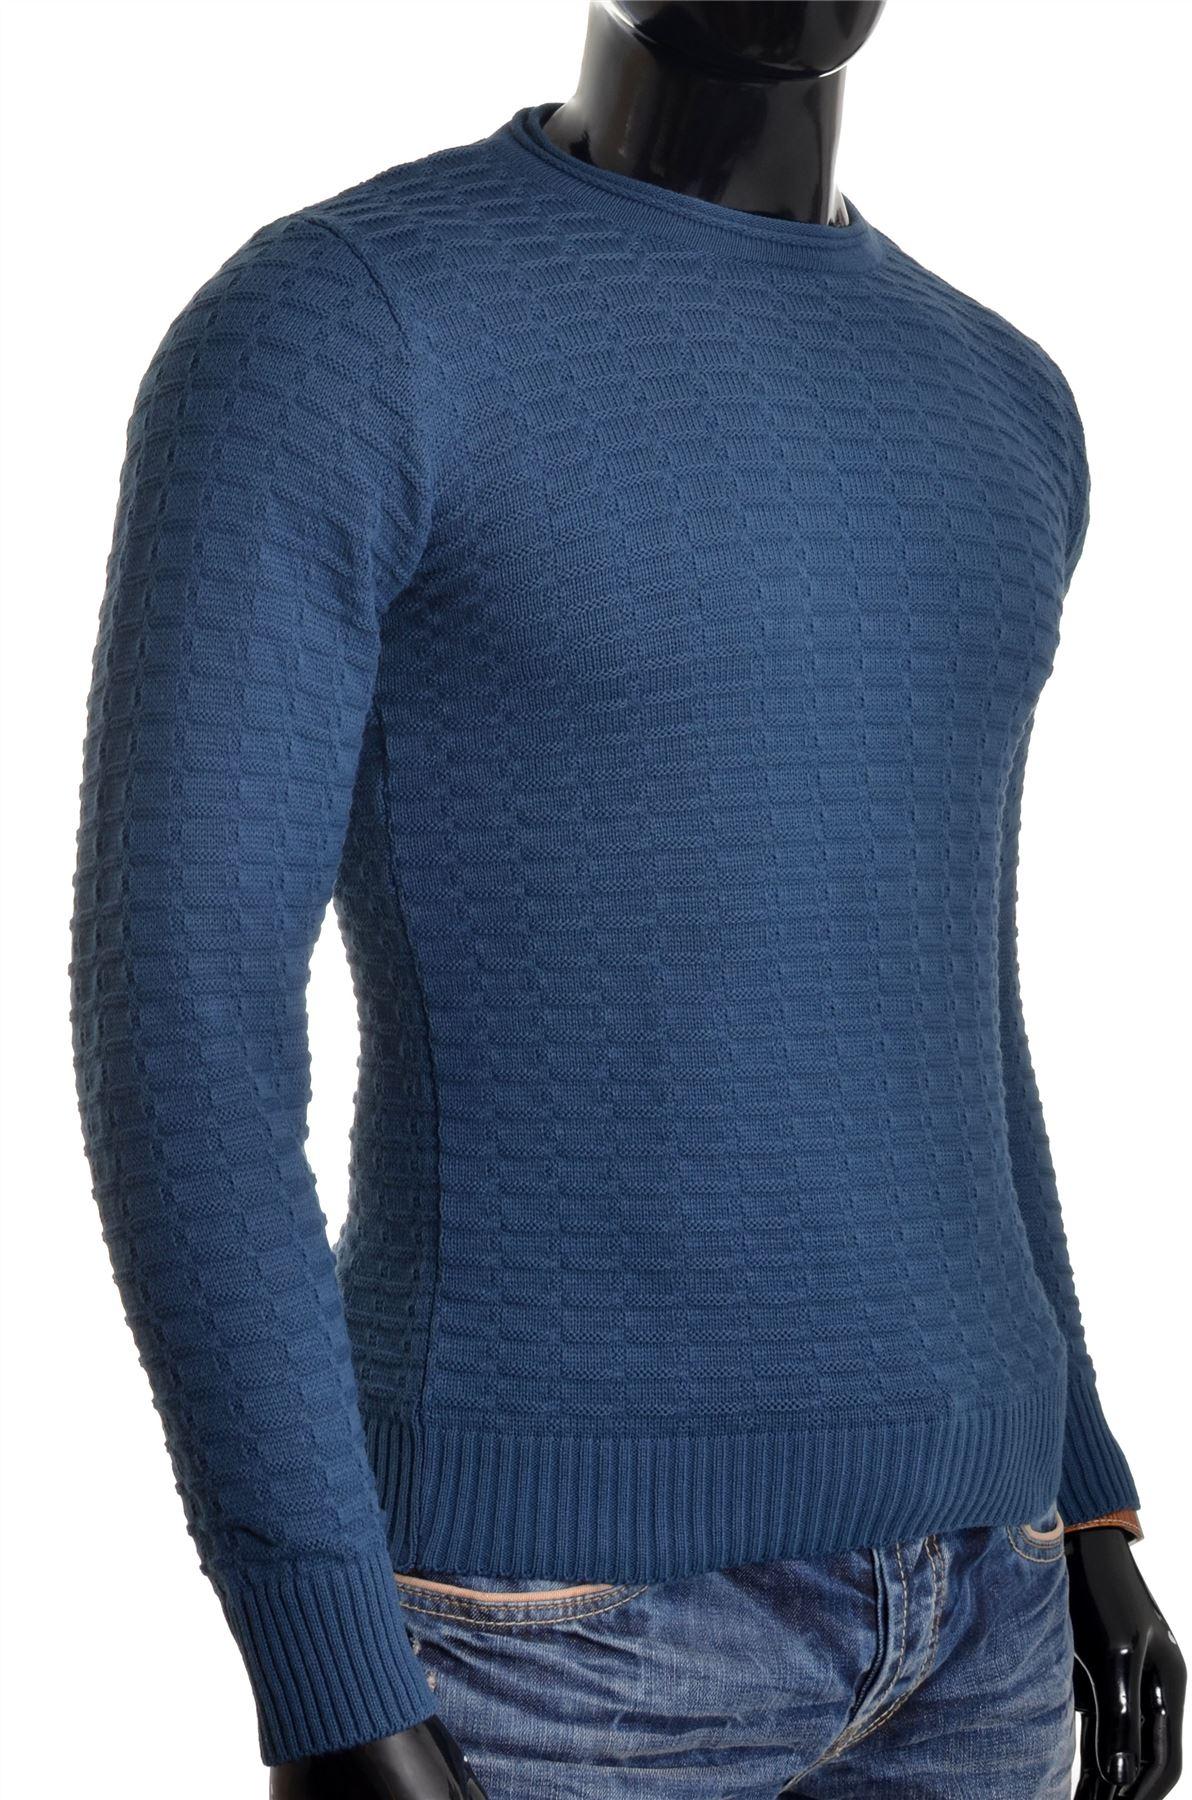 Men-039-s-Jumper-Striped-Knit-Smart-Long-Sleeve-Sweater-Crew-Neck-Top-Slim-Fitness thumbnail 19